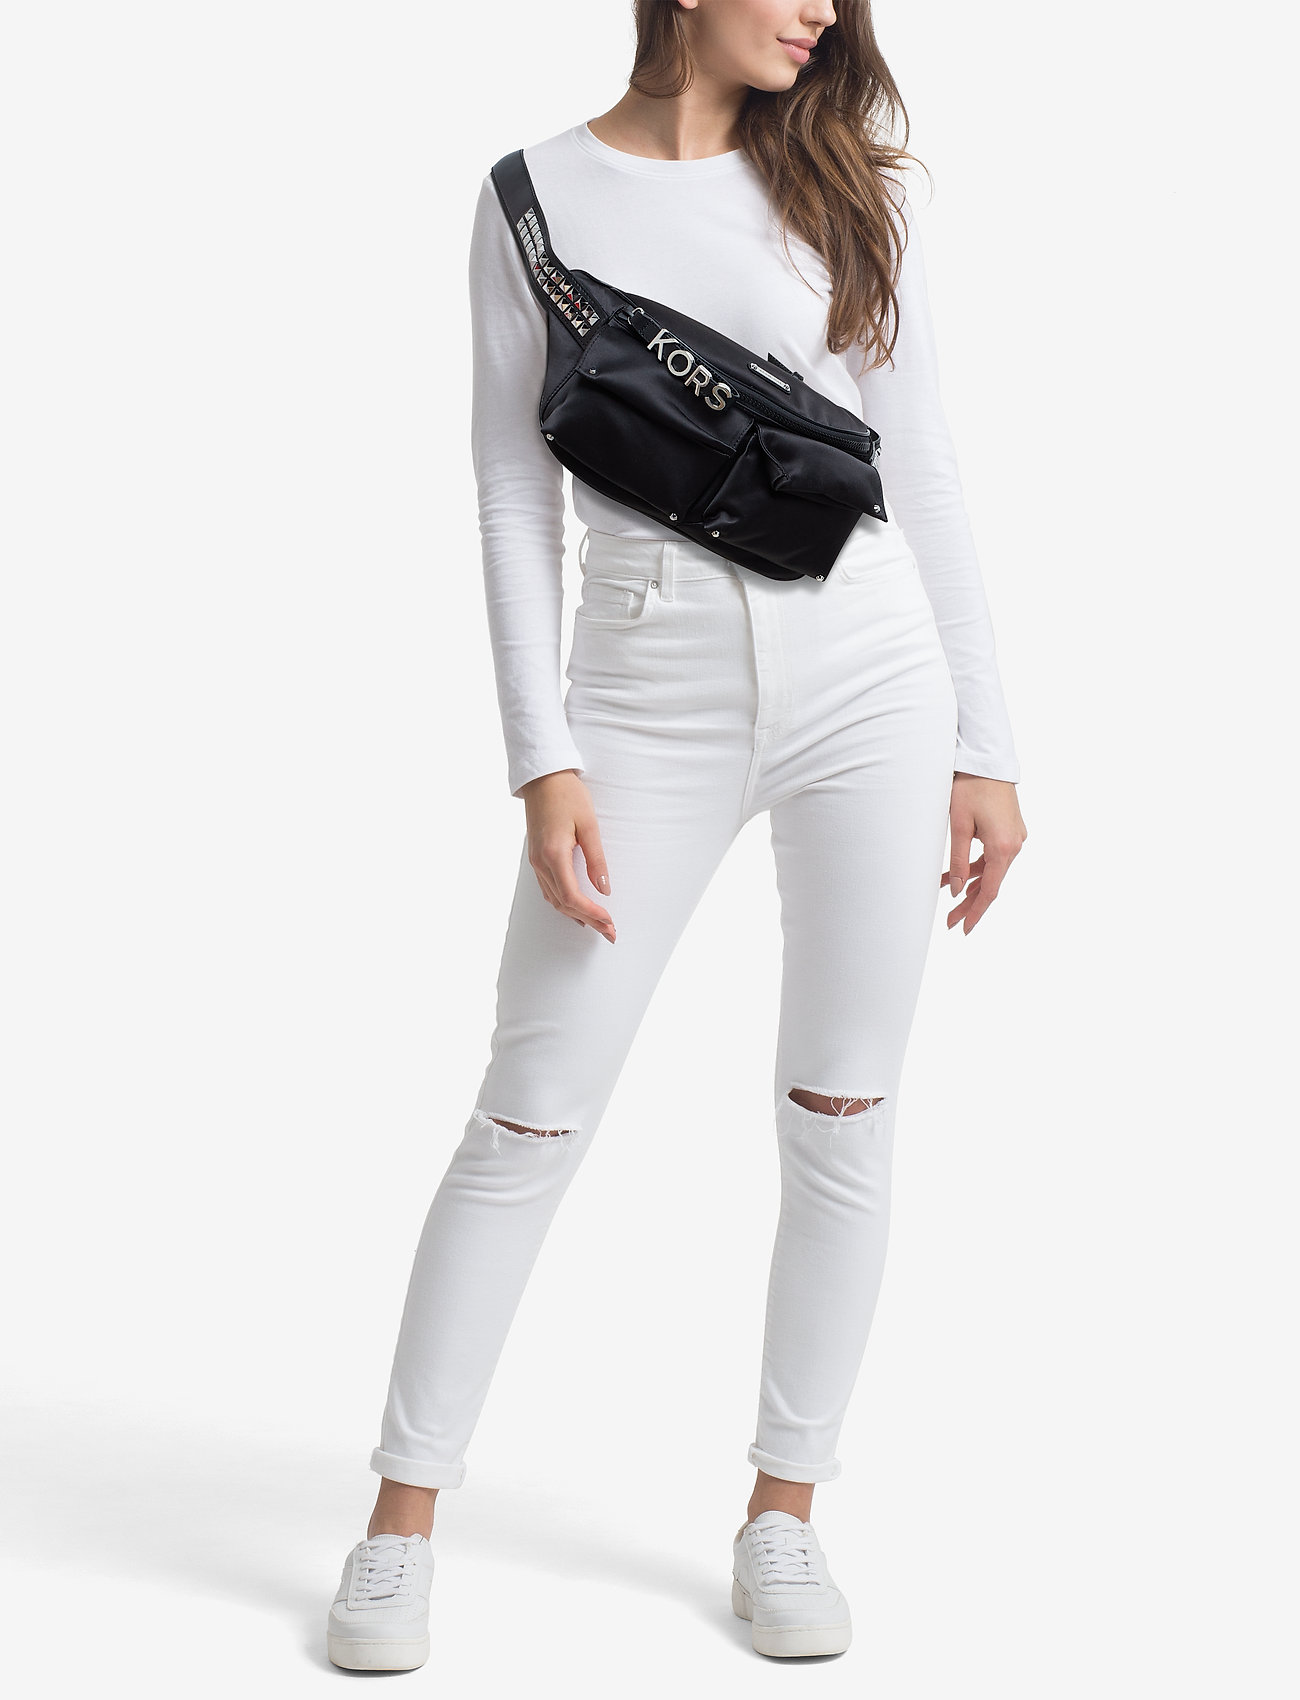 Michael Kors Bags OLIVIA LG WAISTPACK